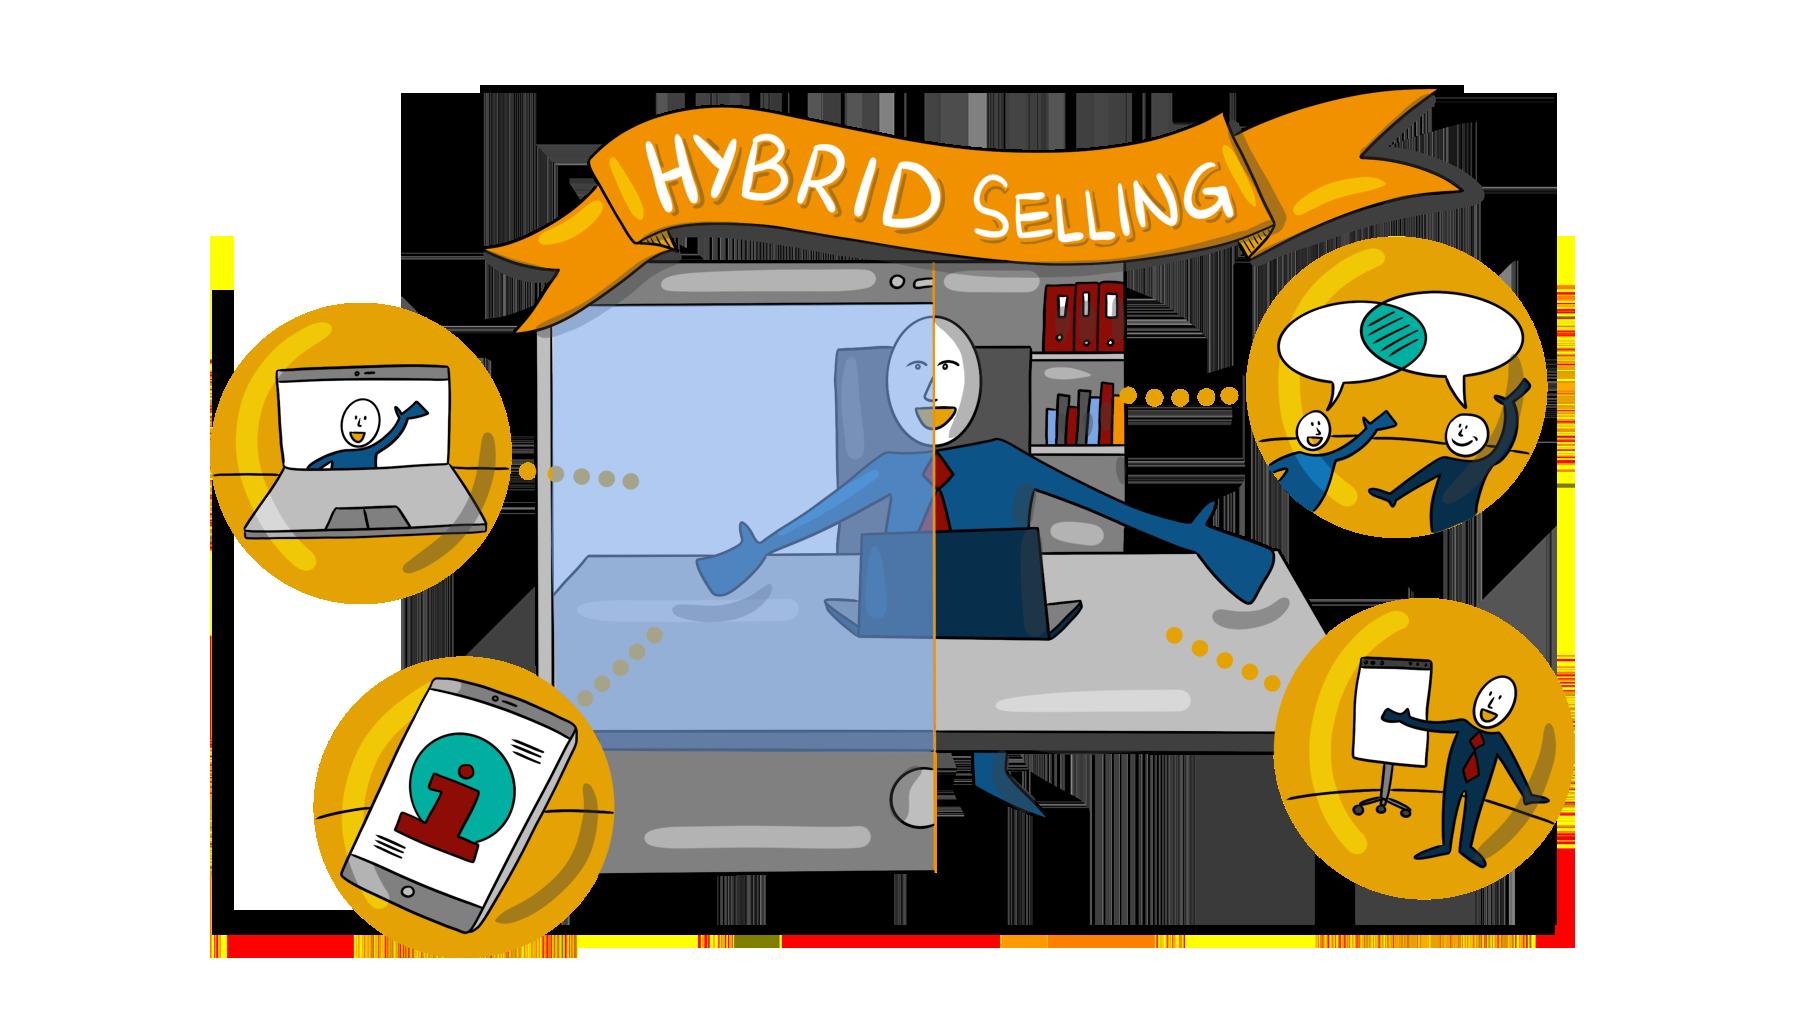 Hybrid Selling Illustration